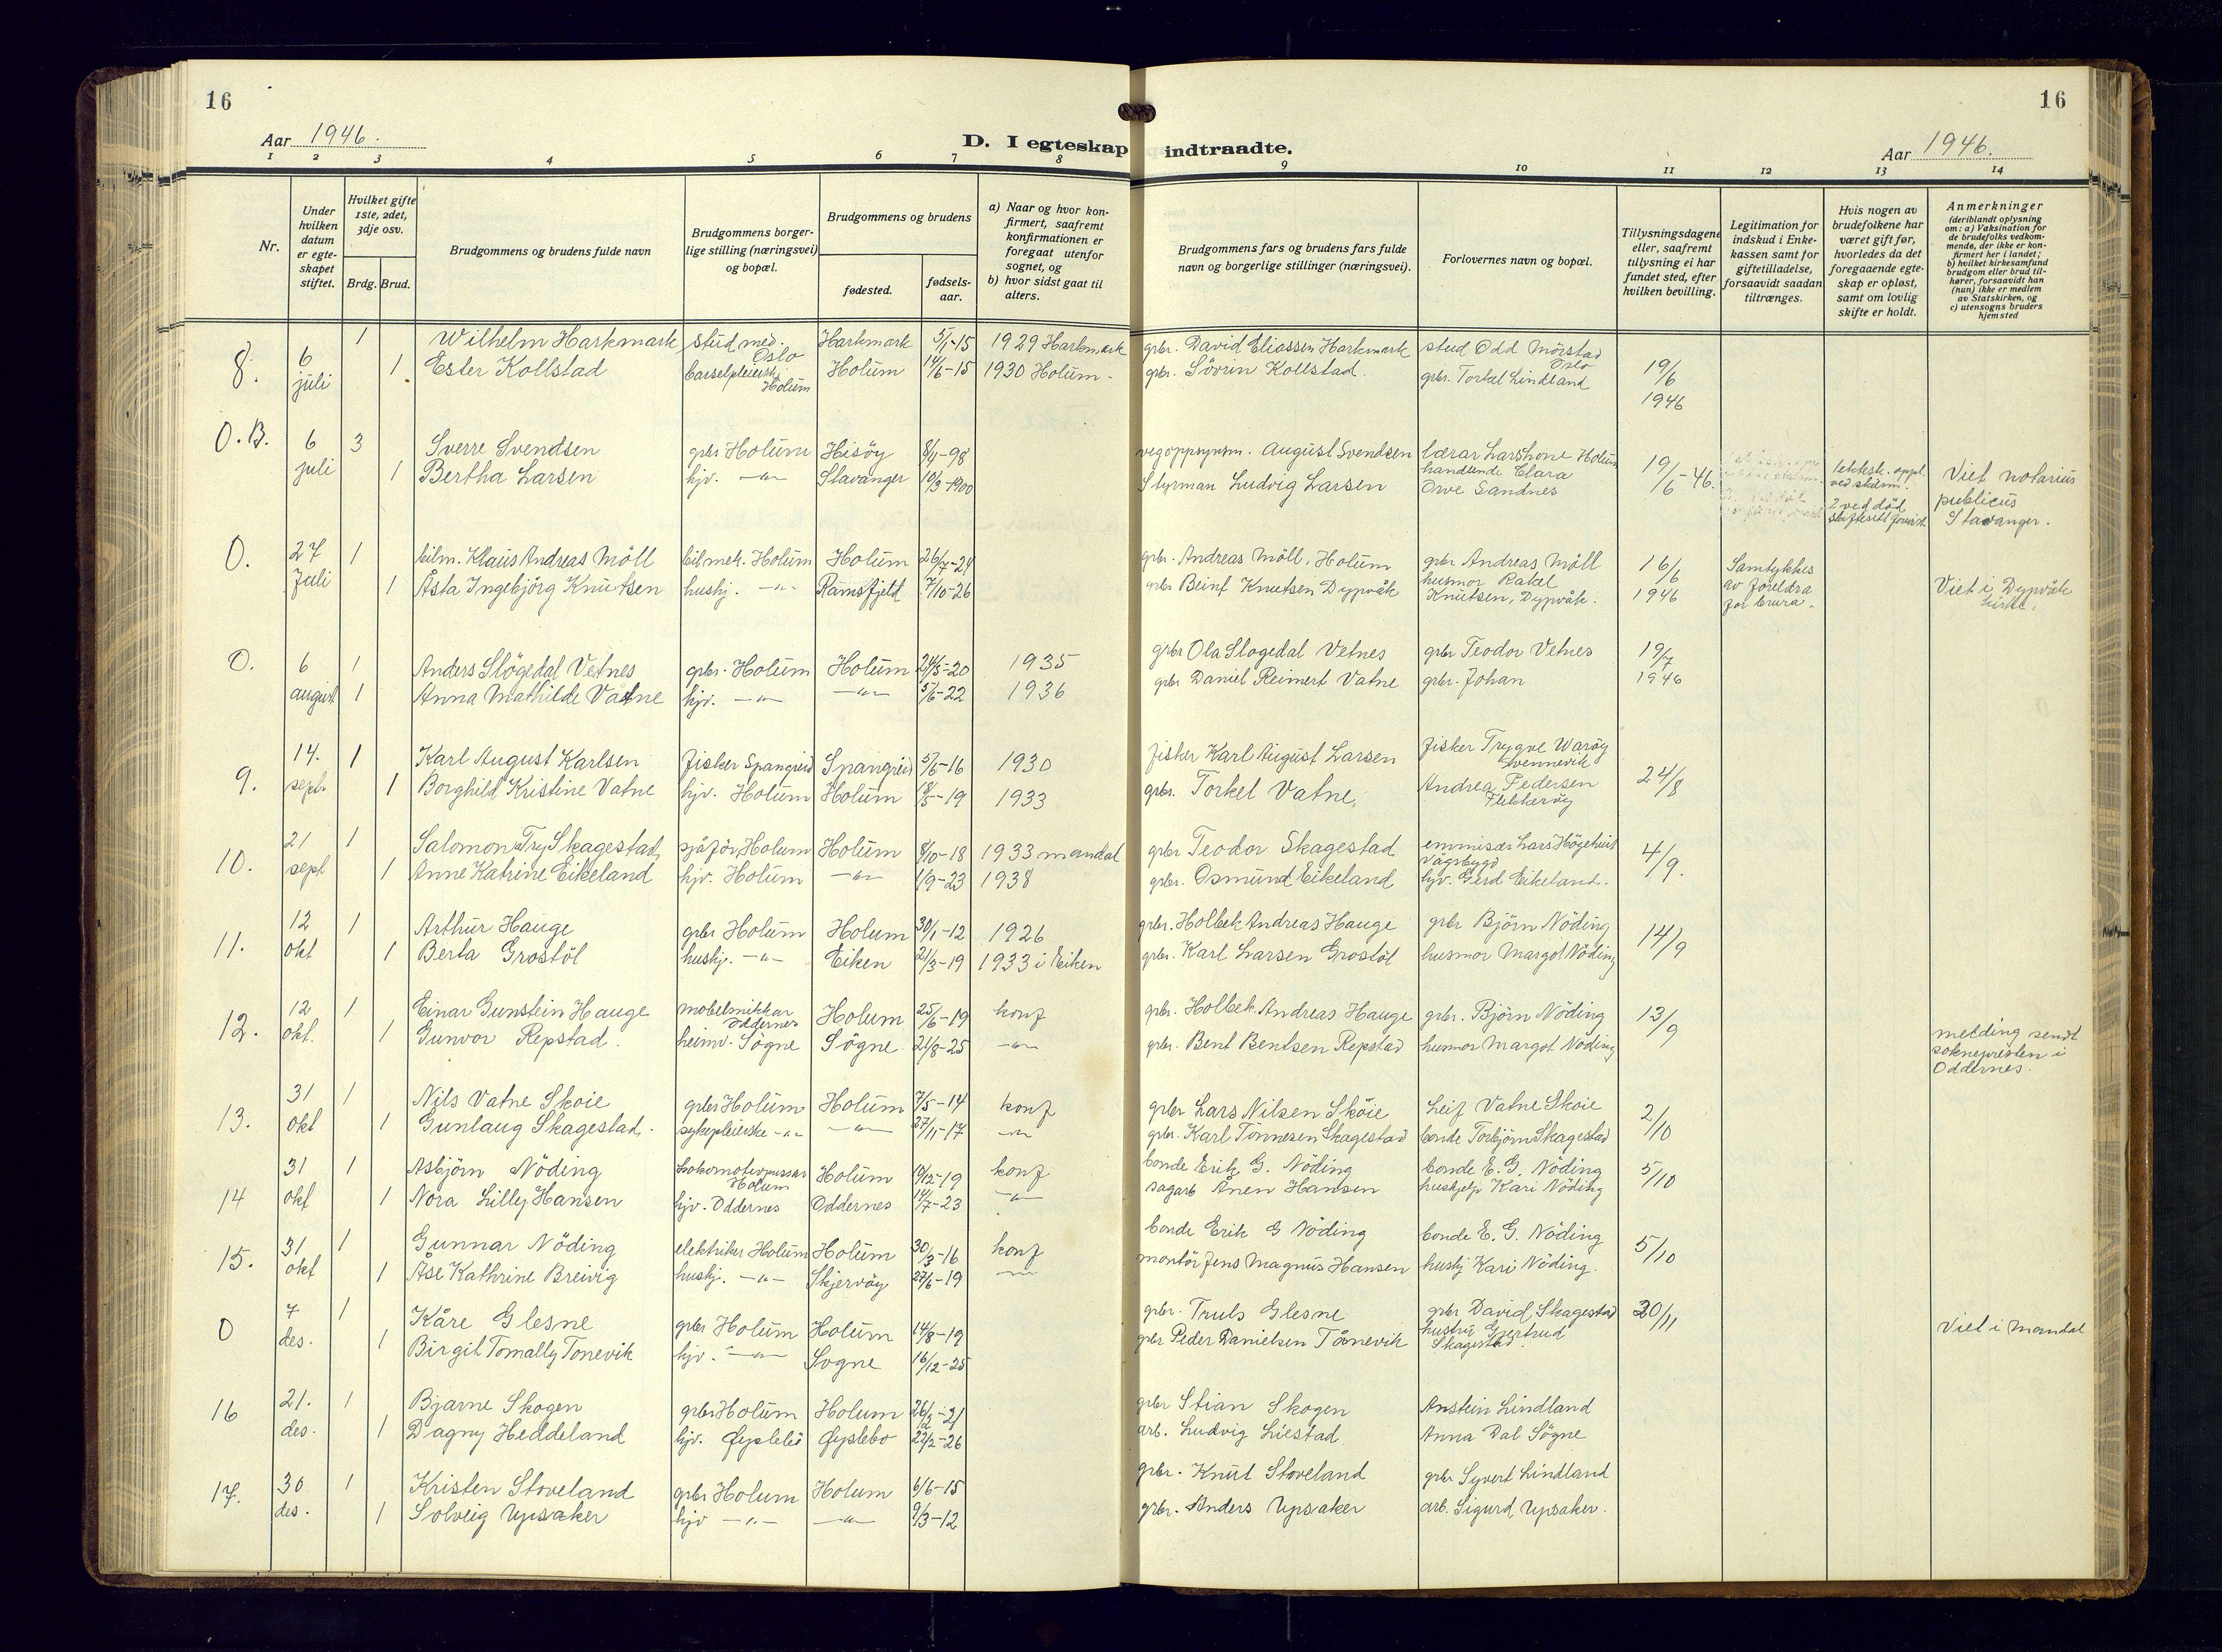 SAK, Holum sokneprestkontor, F/Fb/Fba/L0007: Klokkerbok nr. B-7, 1933-1960, s. 16